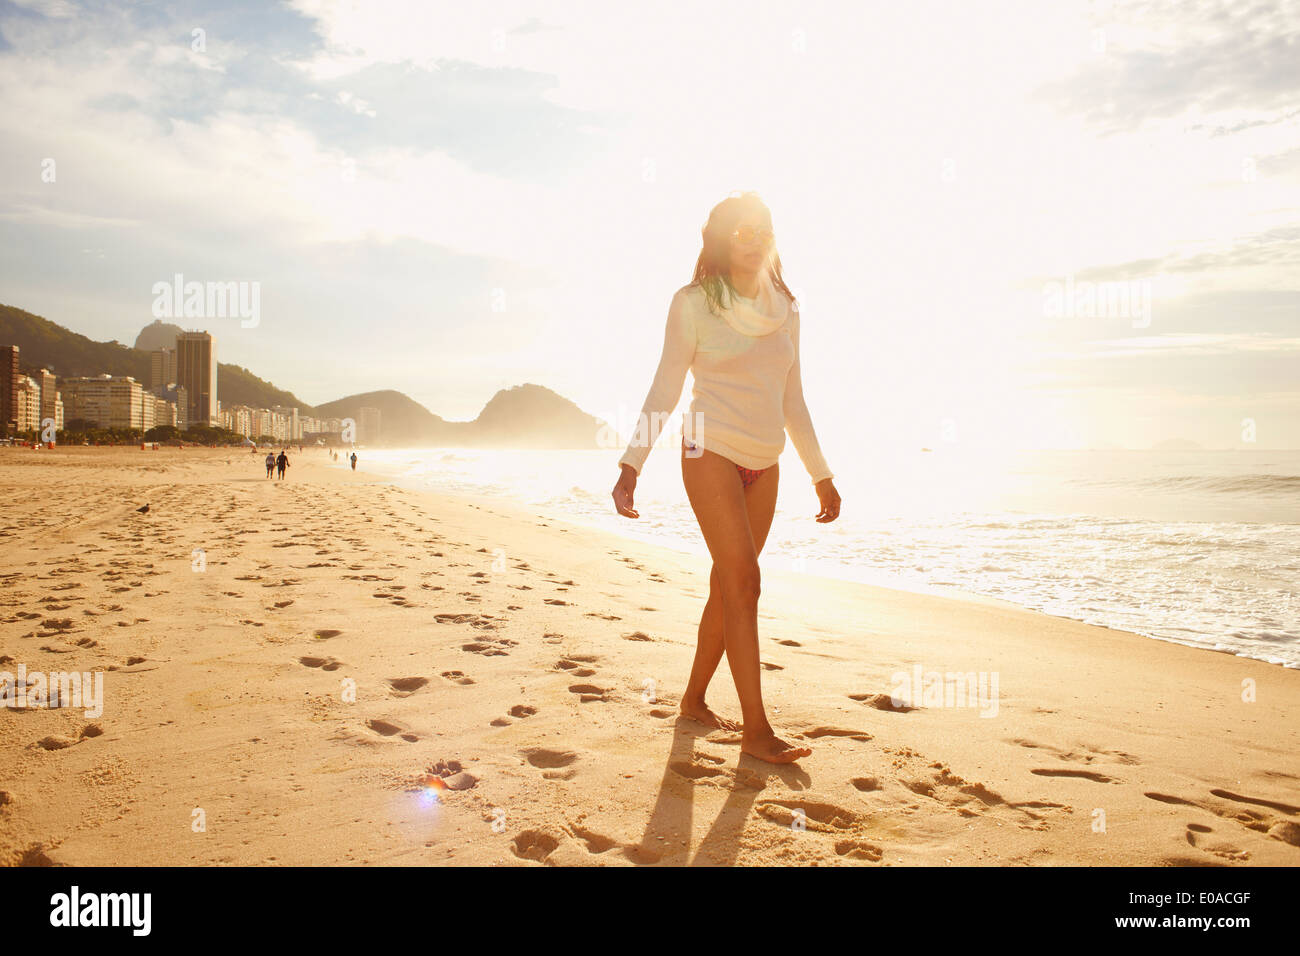 Mature woman strolling on sunlit Copacabana beach, Rio De Janeiro, Brazil - Stock Image